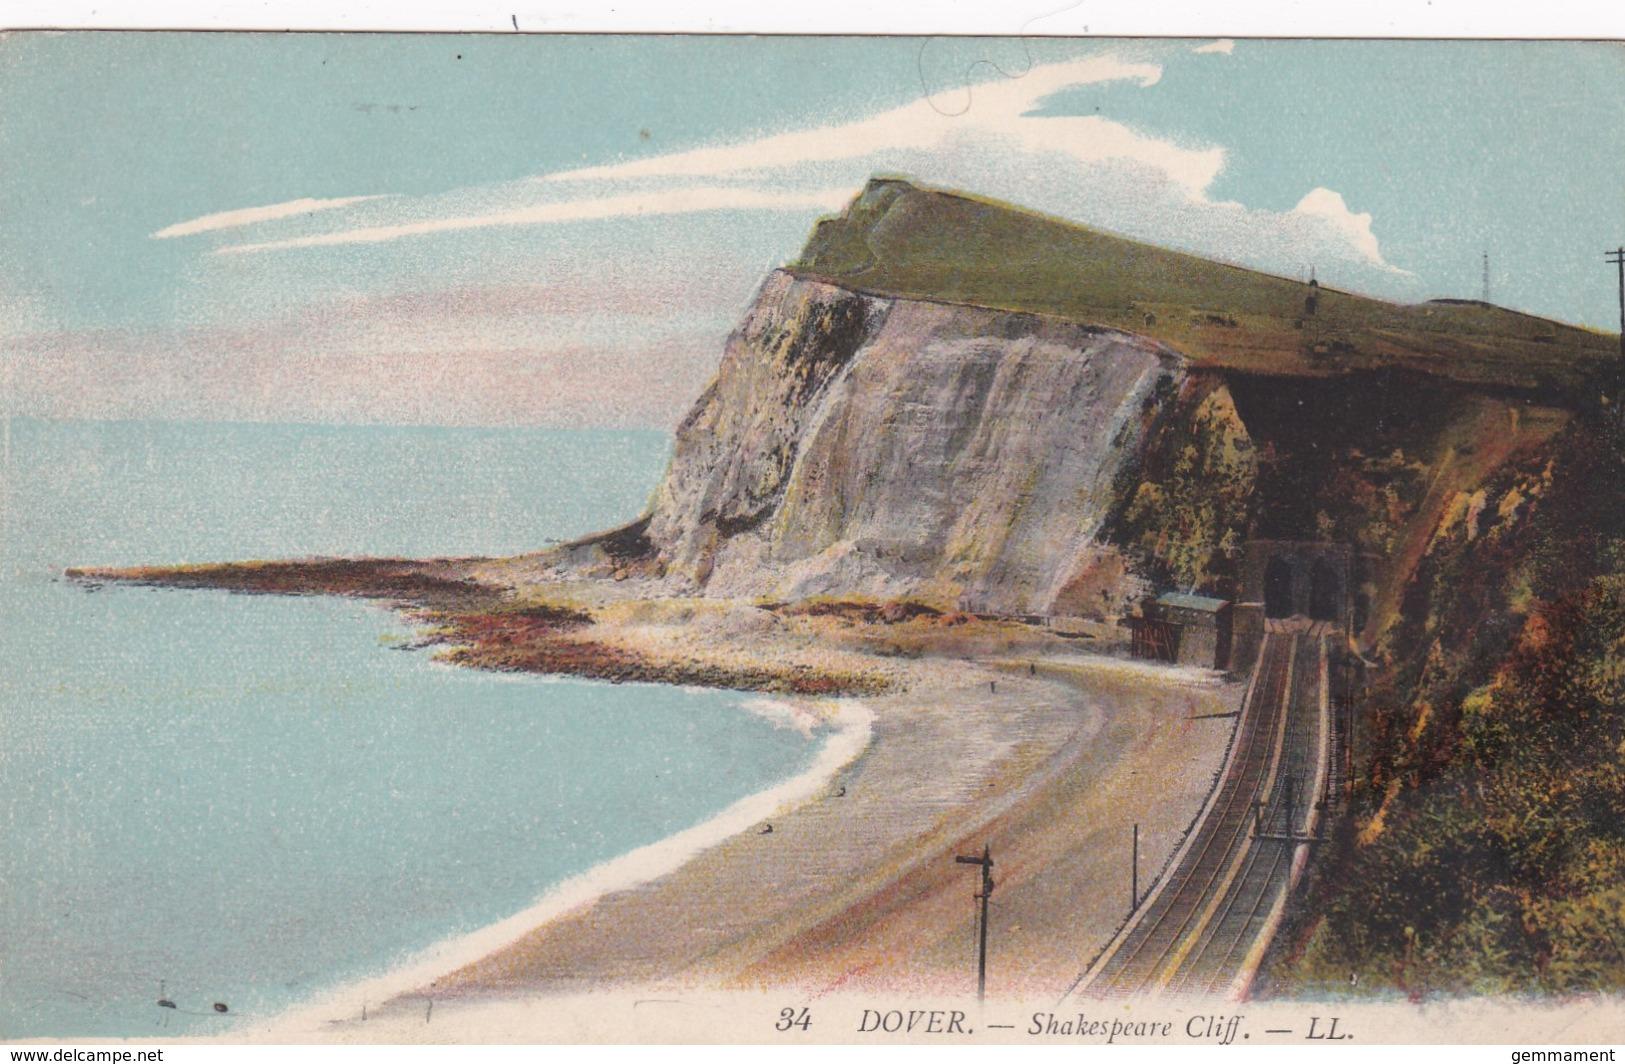 DOVER - SHAKESPEARE CLIFF   LL 34 - Dover